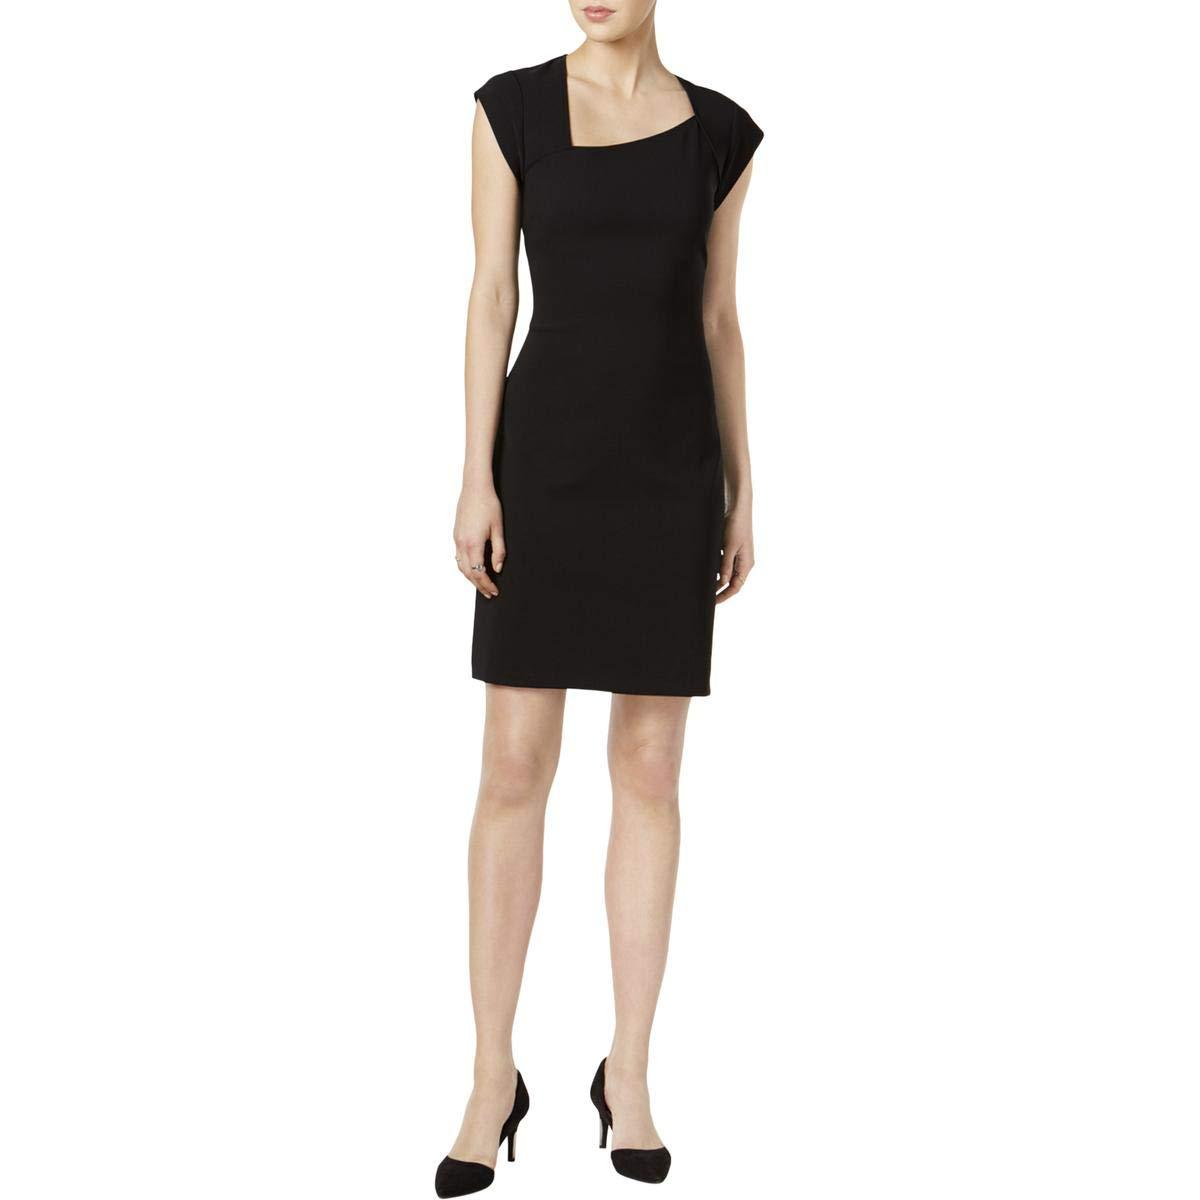 Deepblack Bar III Womens Asymmetrical Above Knee Cocktail Dress